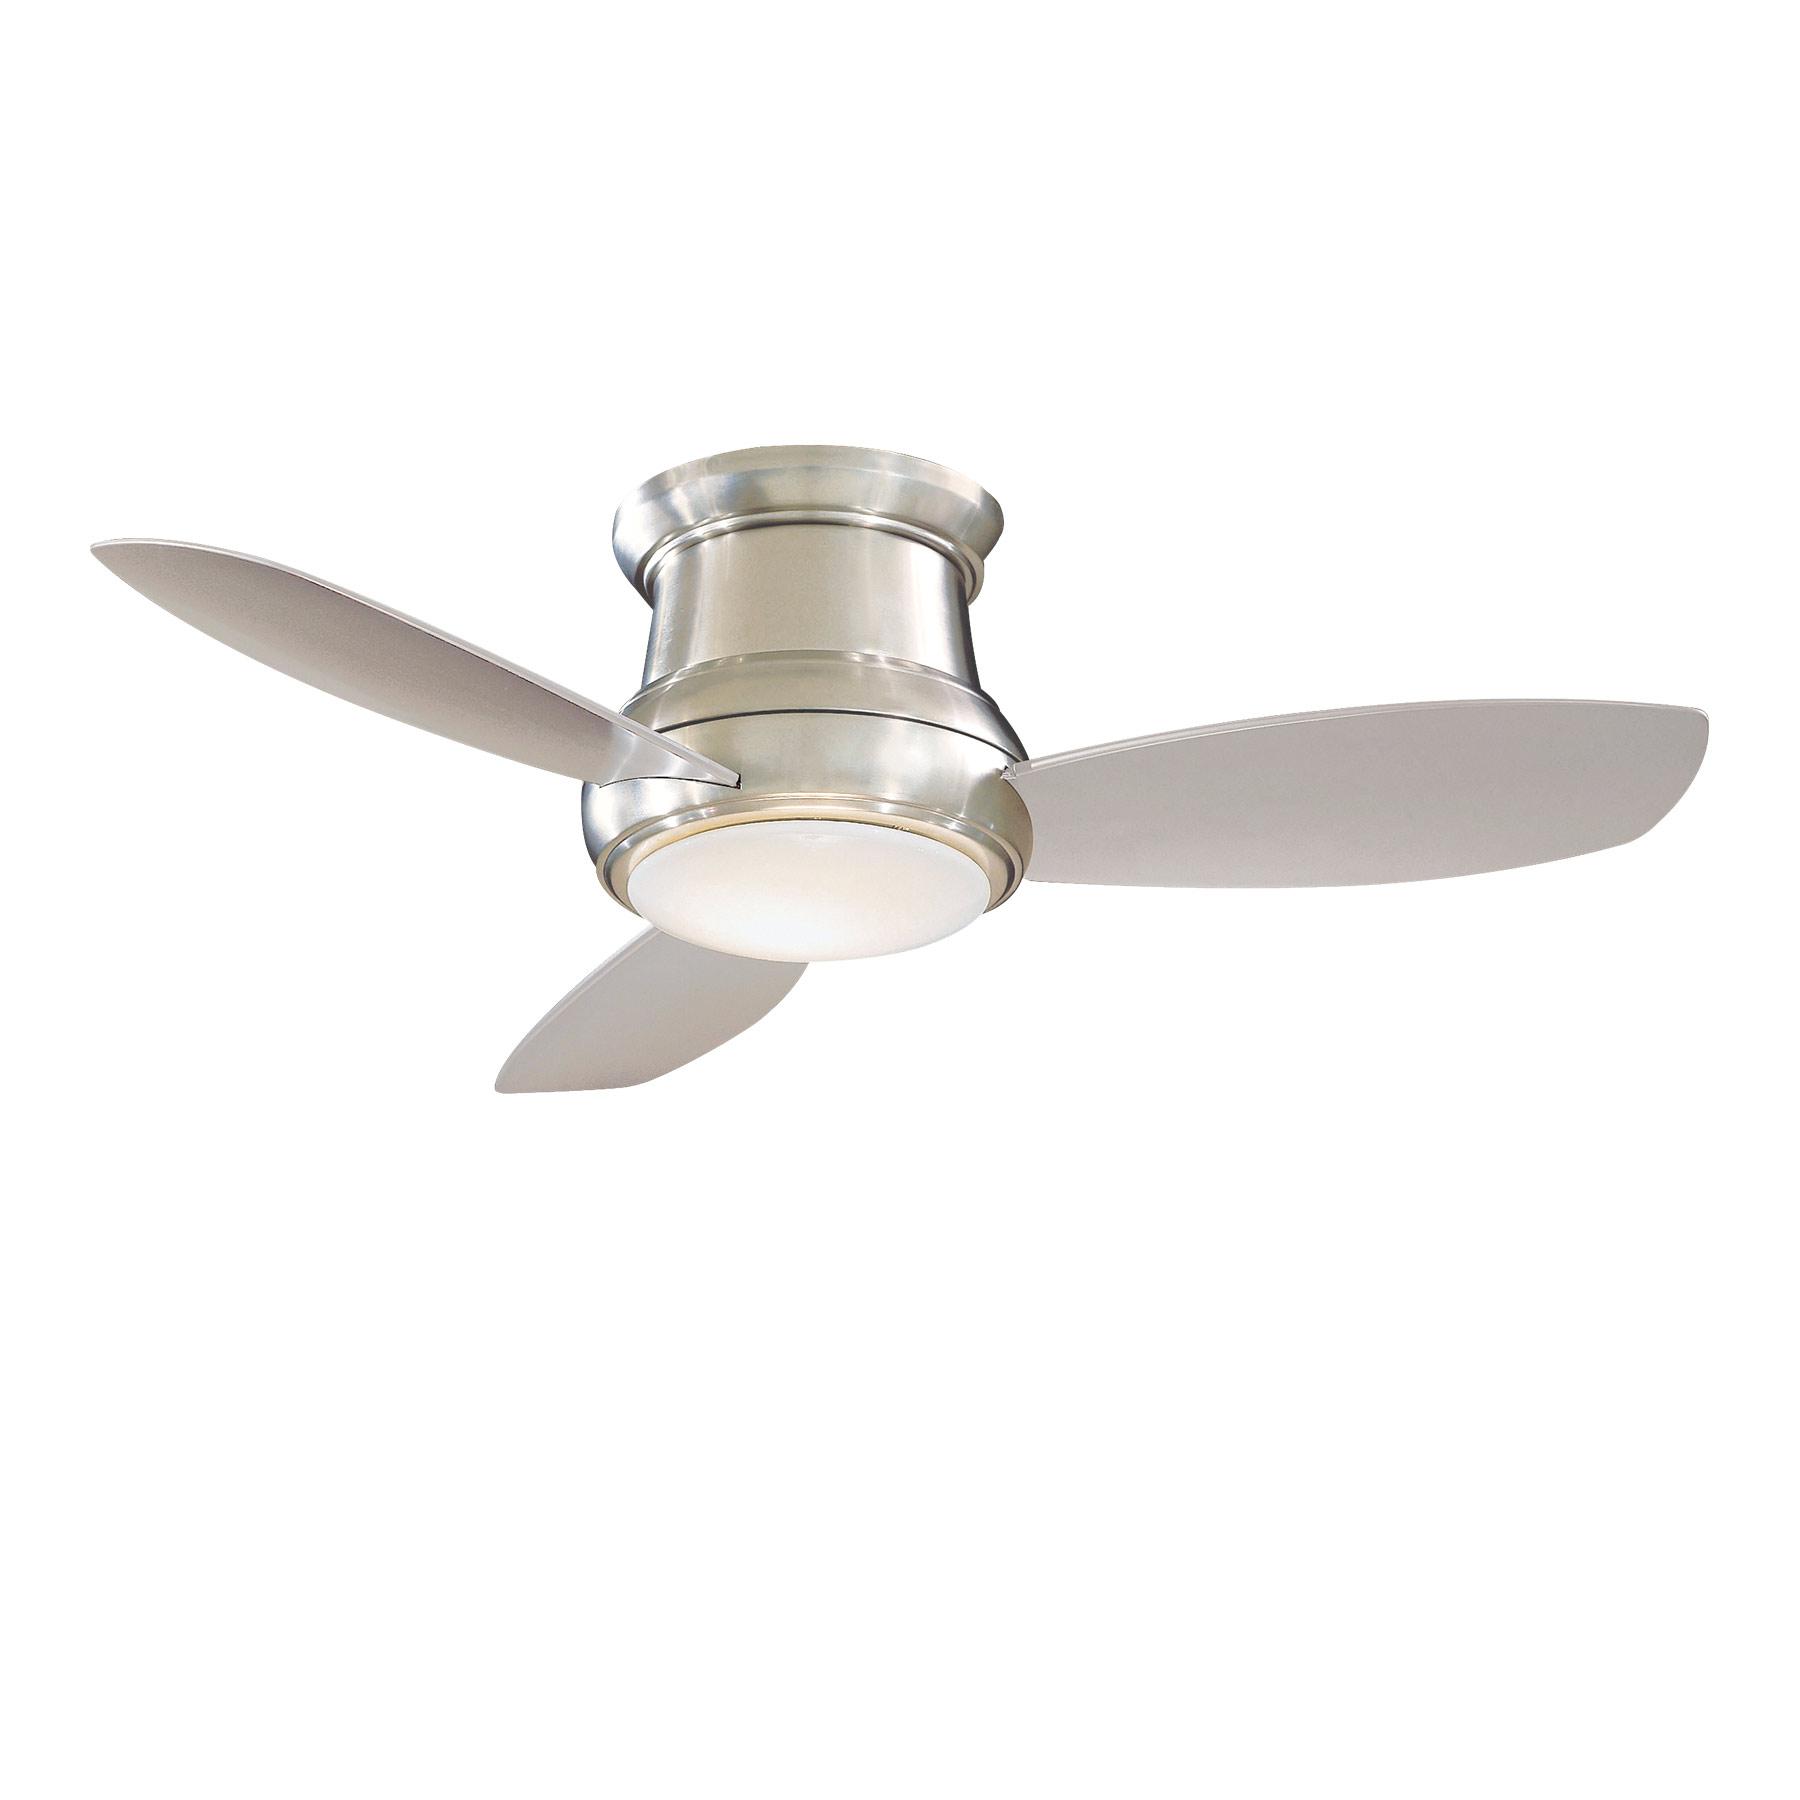 Concept II Ceiling Fan LED by Minka Aire | F518L-BN